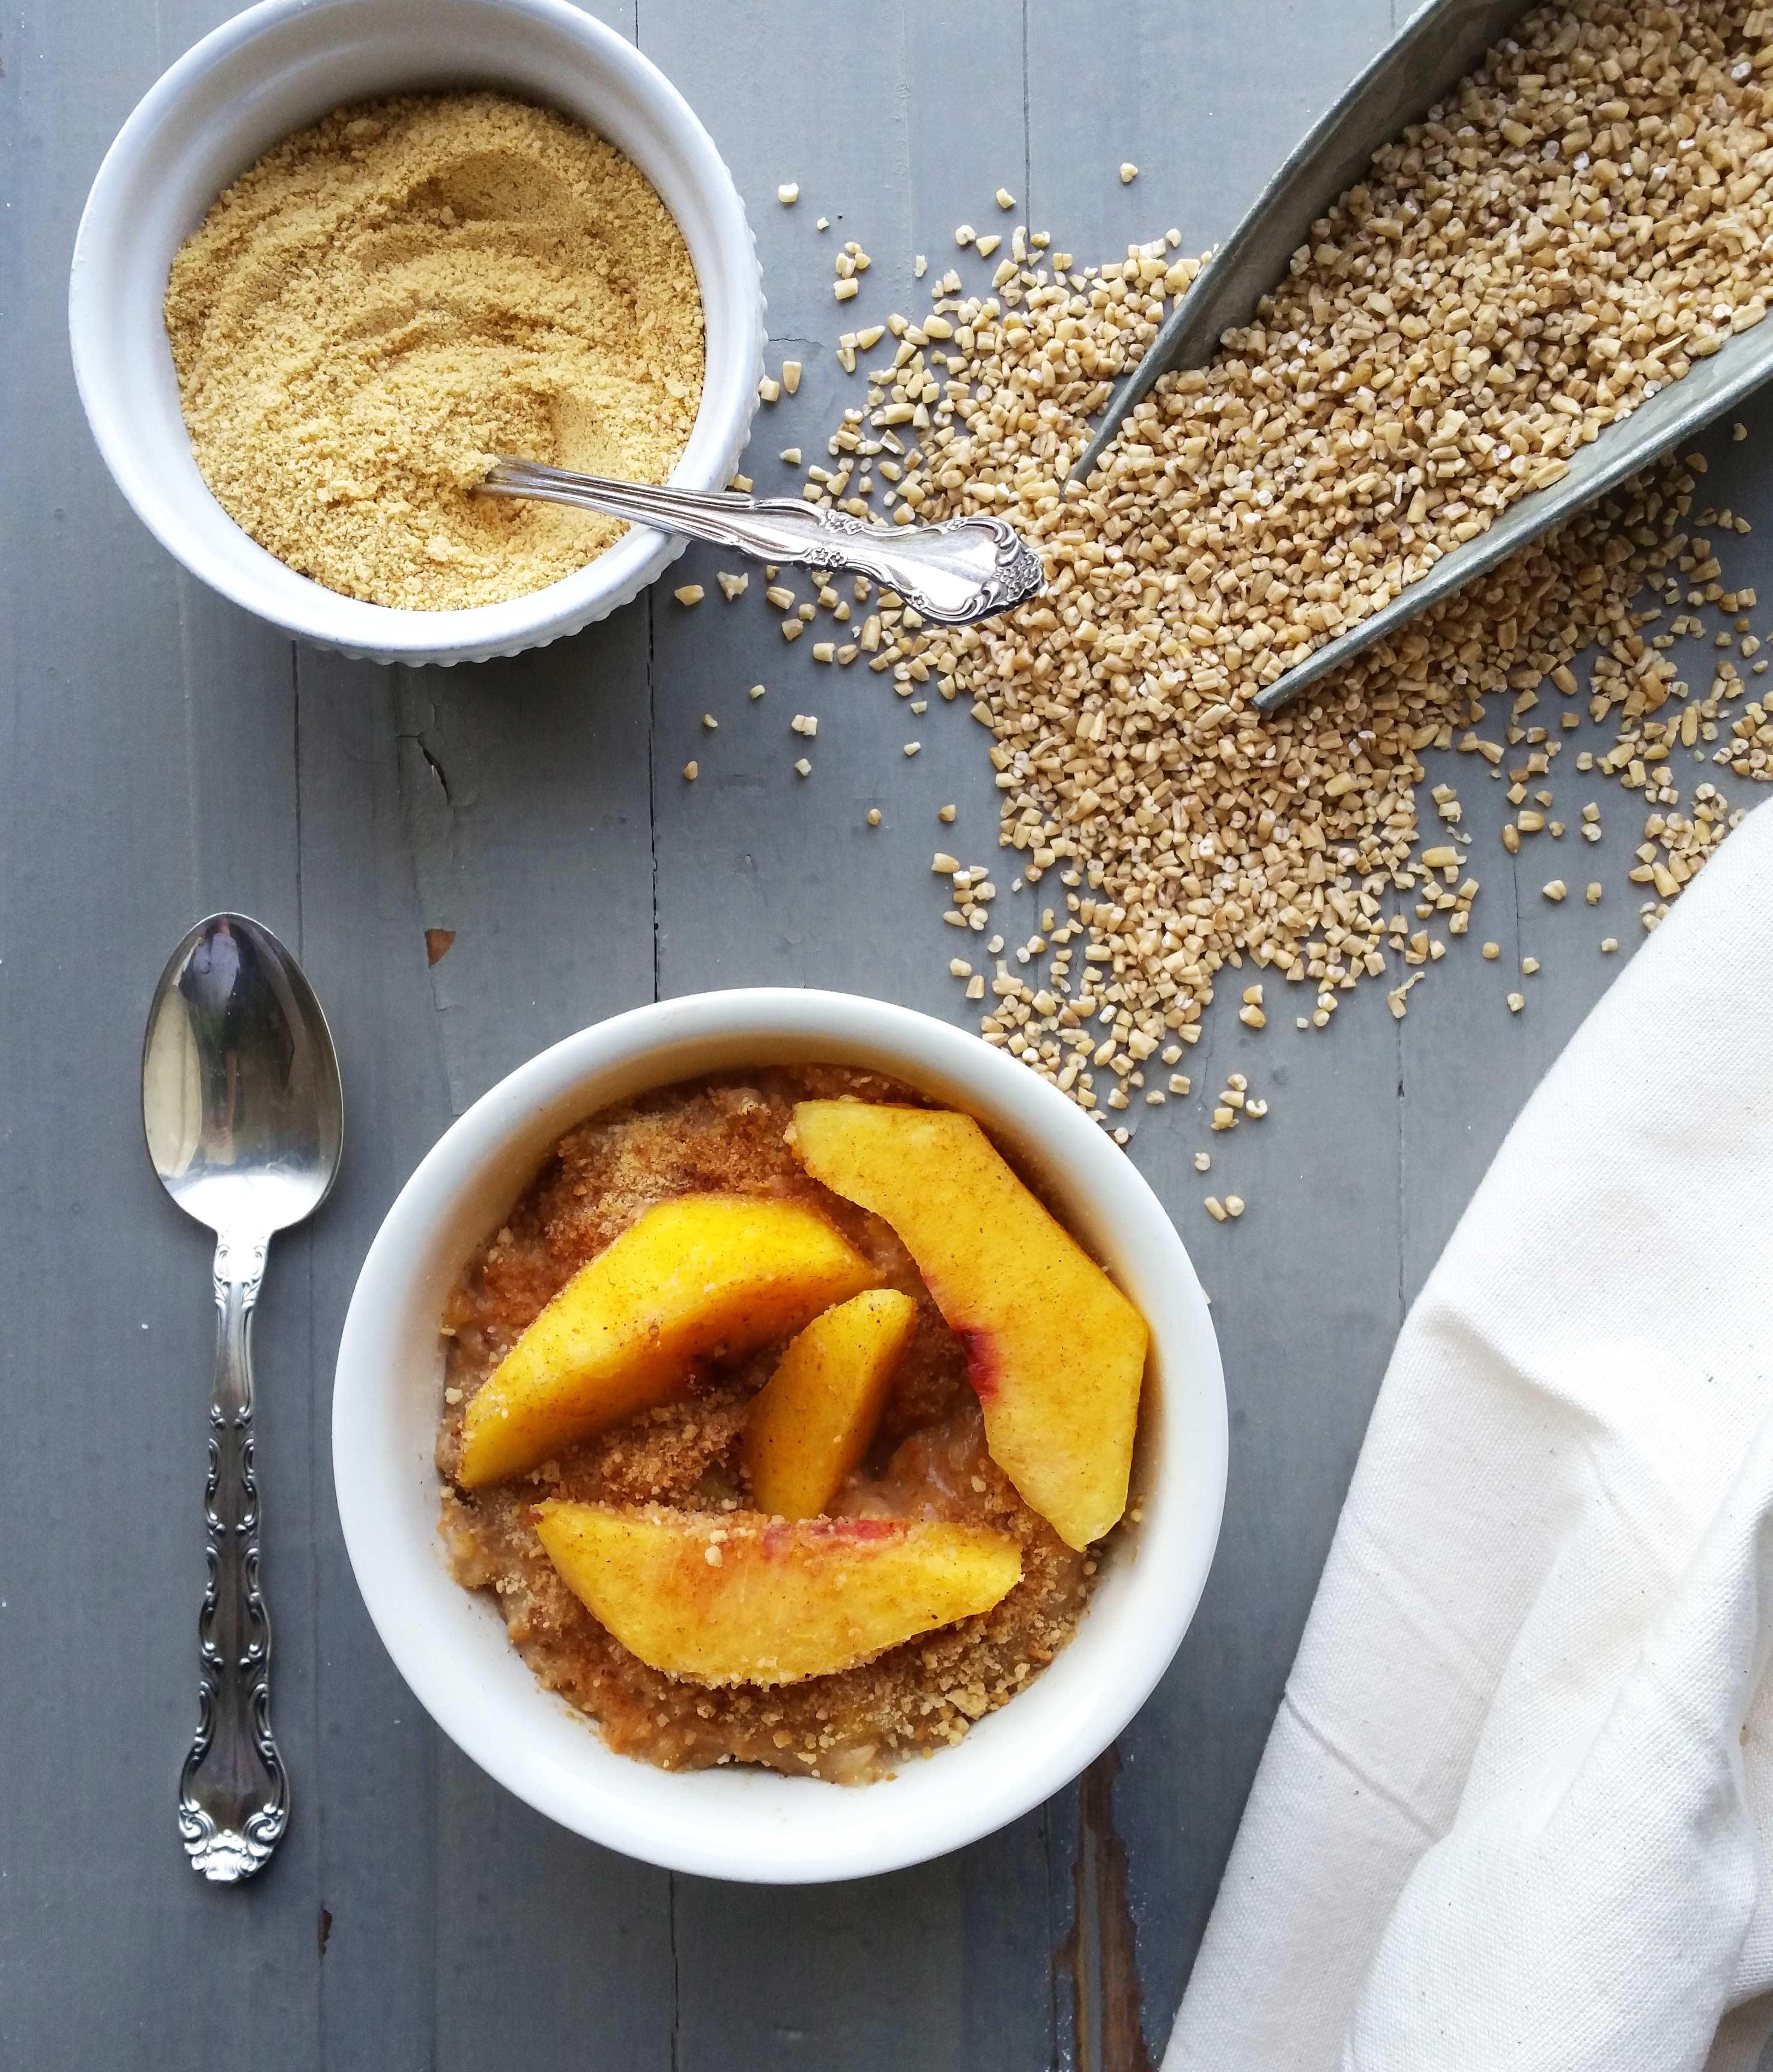 Crockpot-Peach-Crisp-Oatmeal